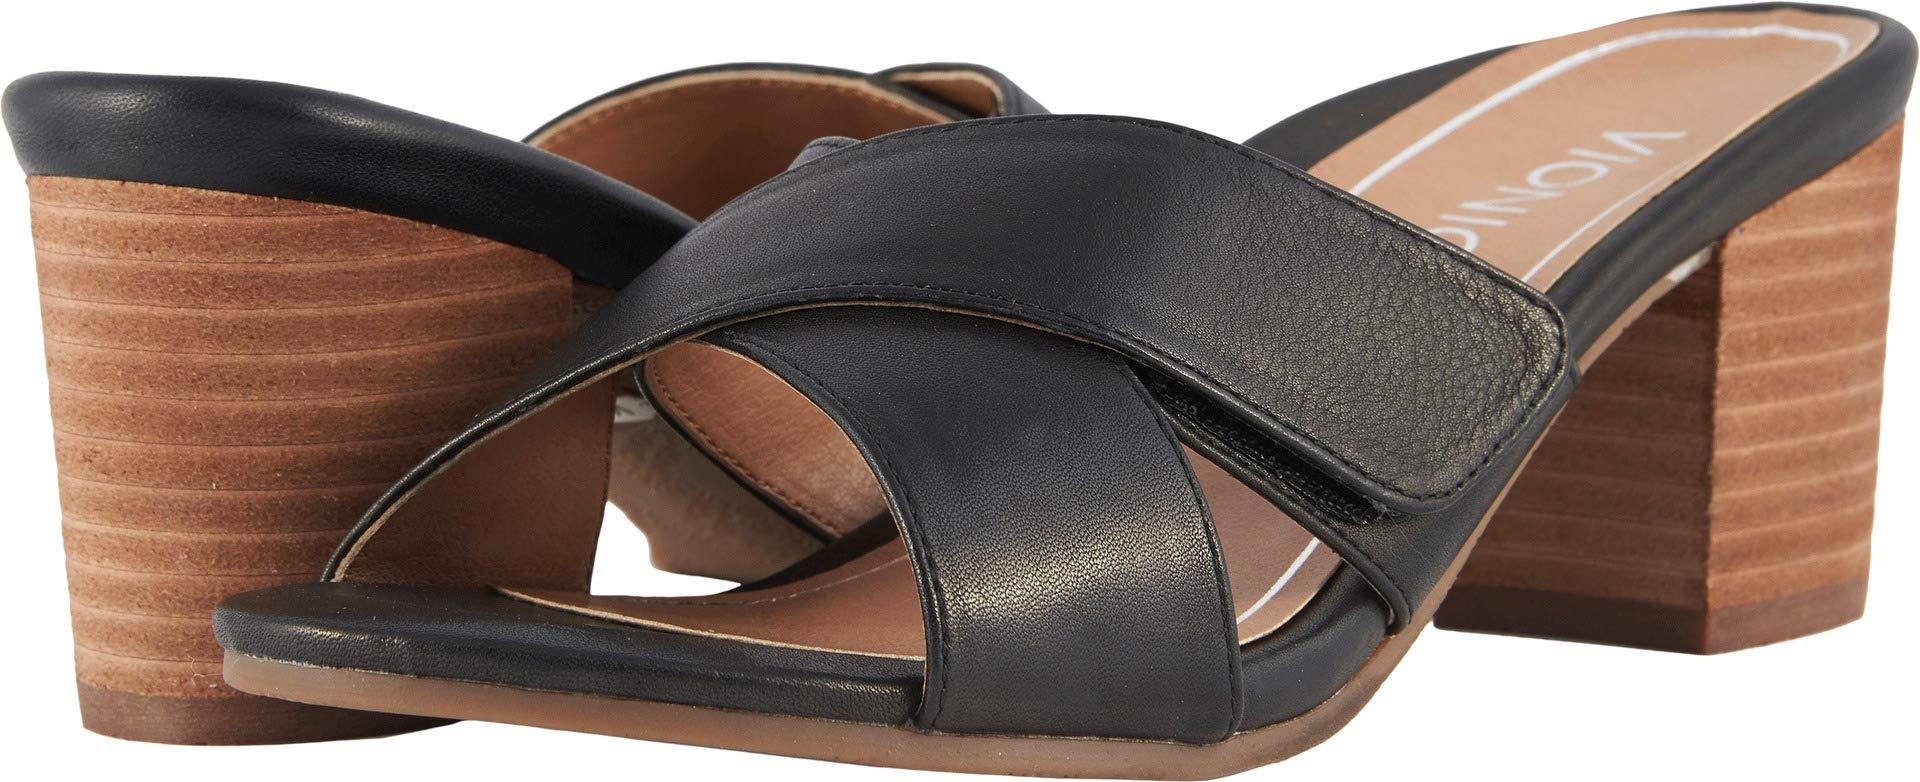 Vionic Women's Lorne Slide Sandal Black 8 M